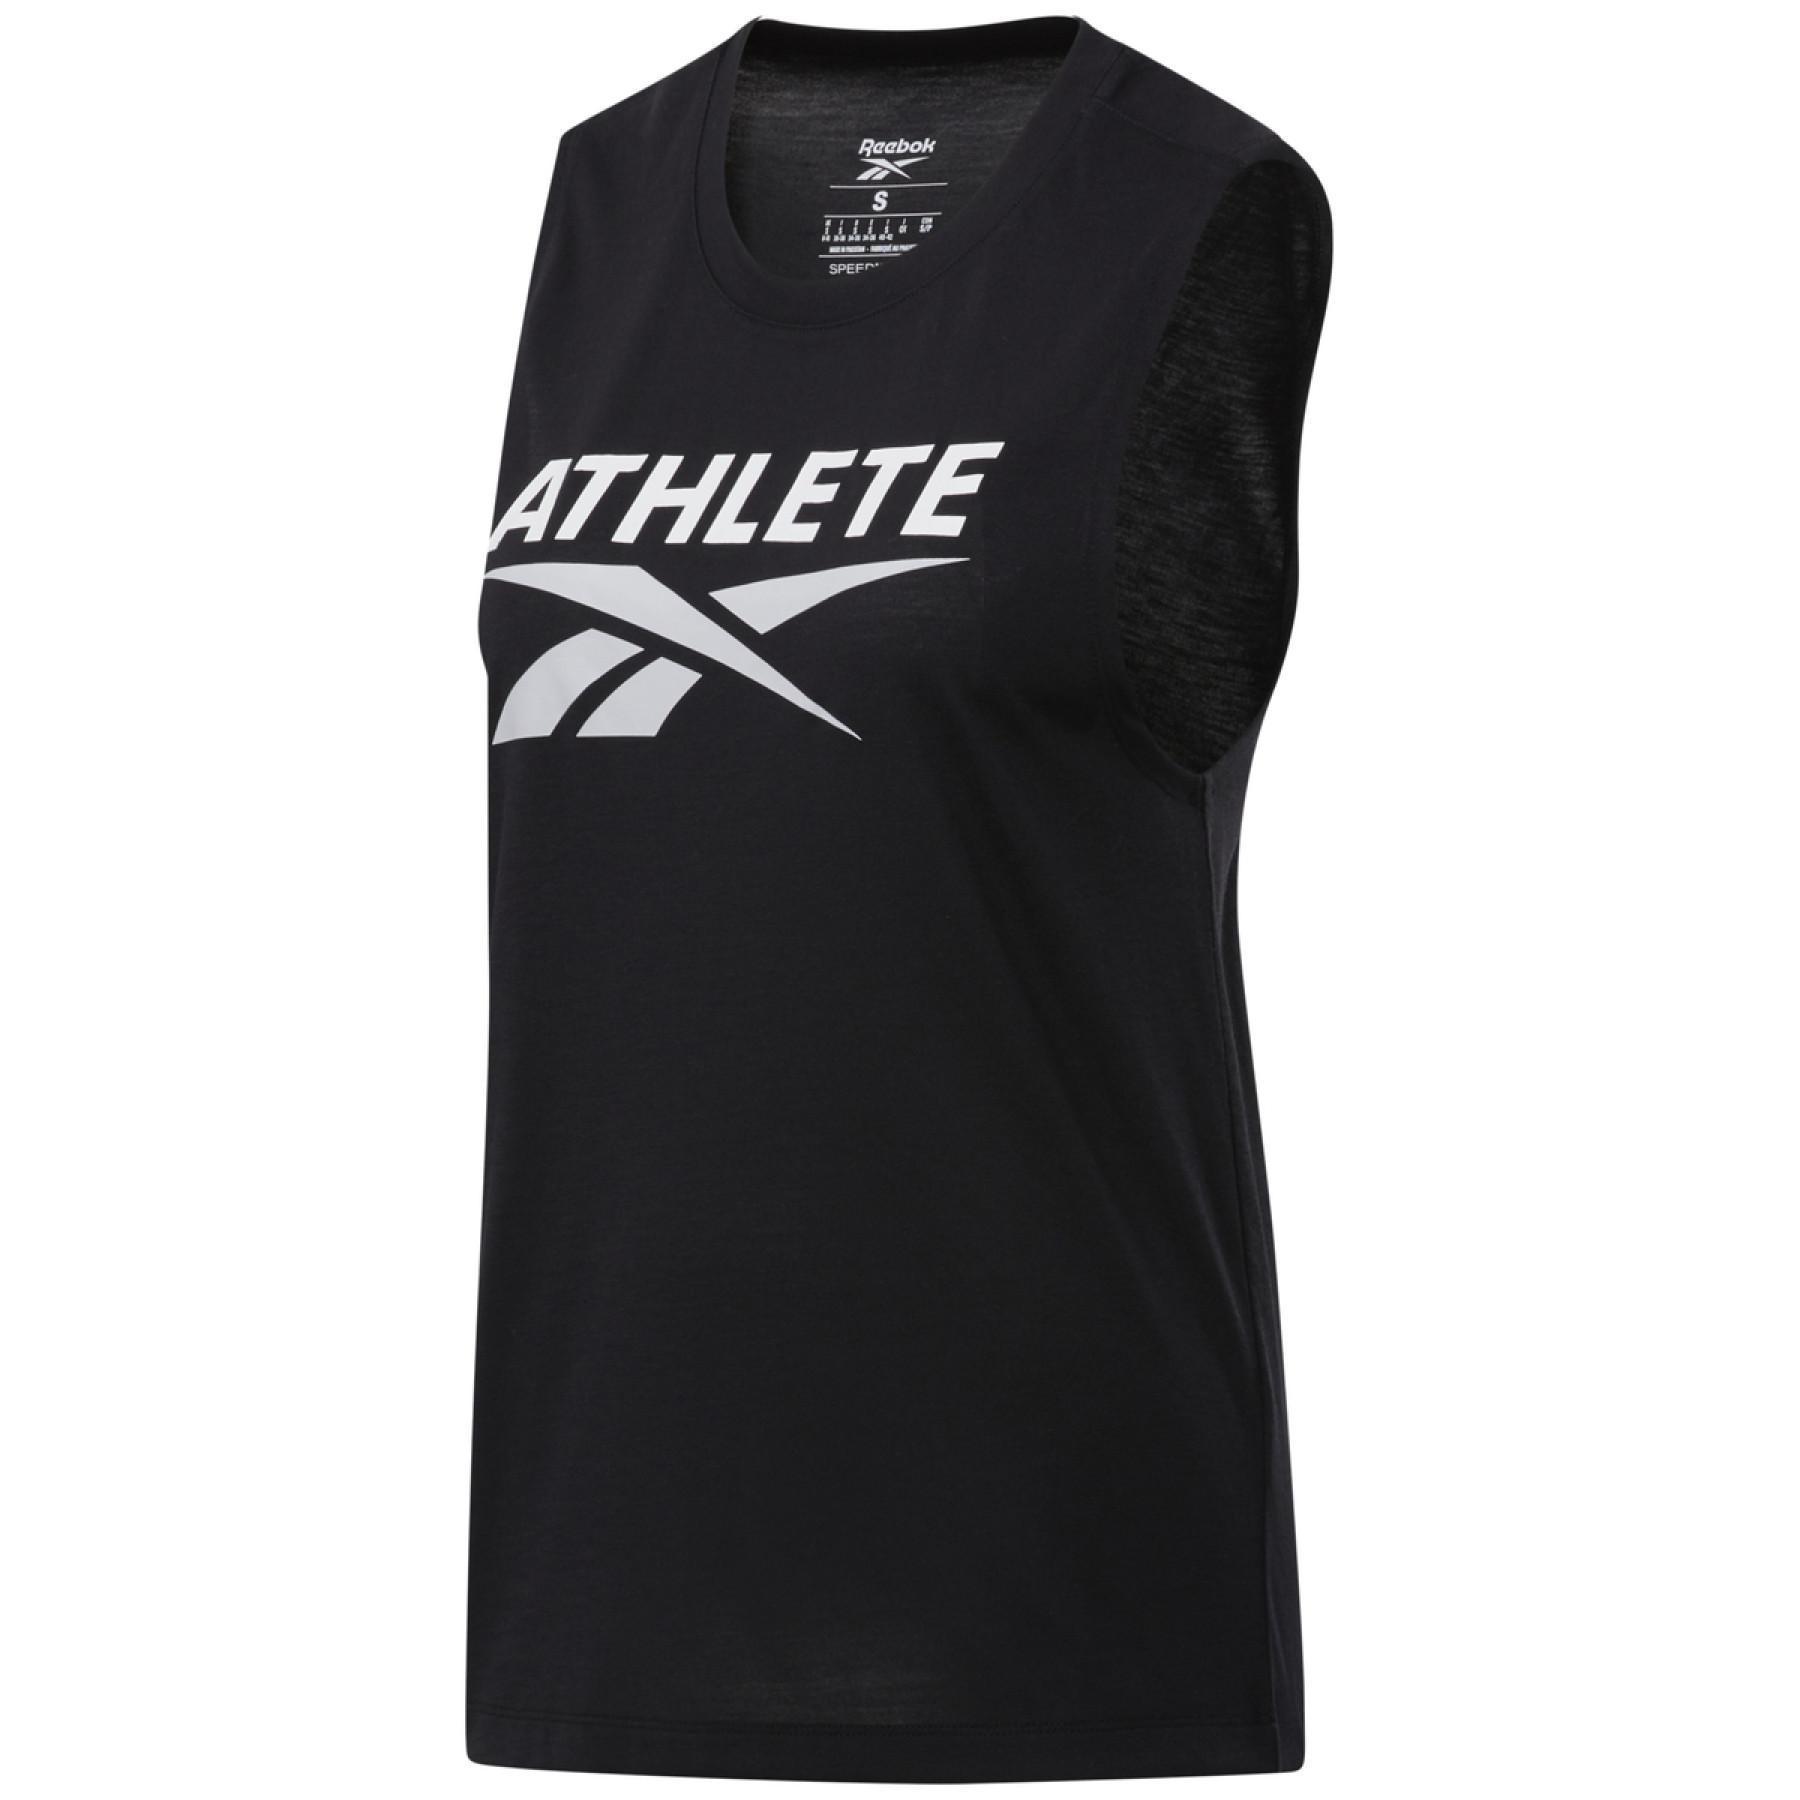 Reebok Athlete Vector Tank Top woman's T-shirt